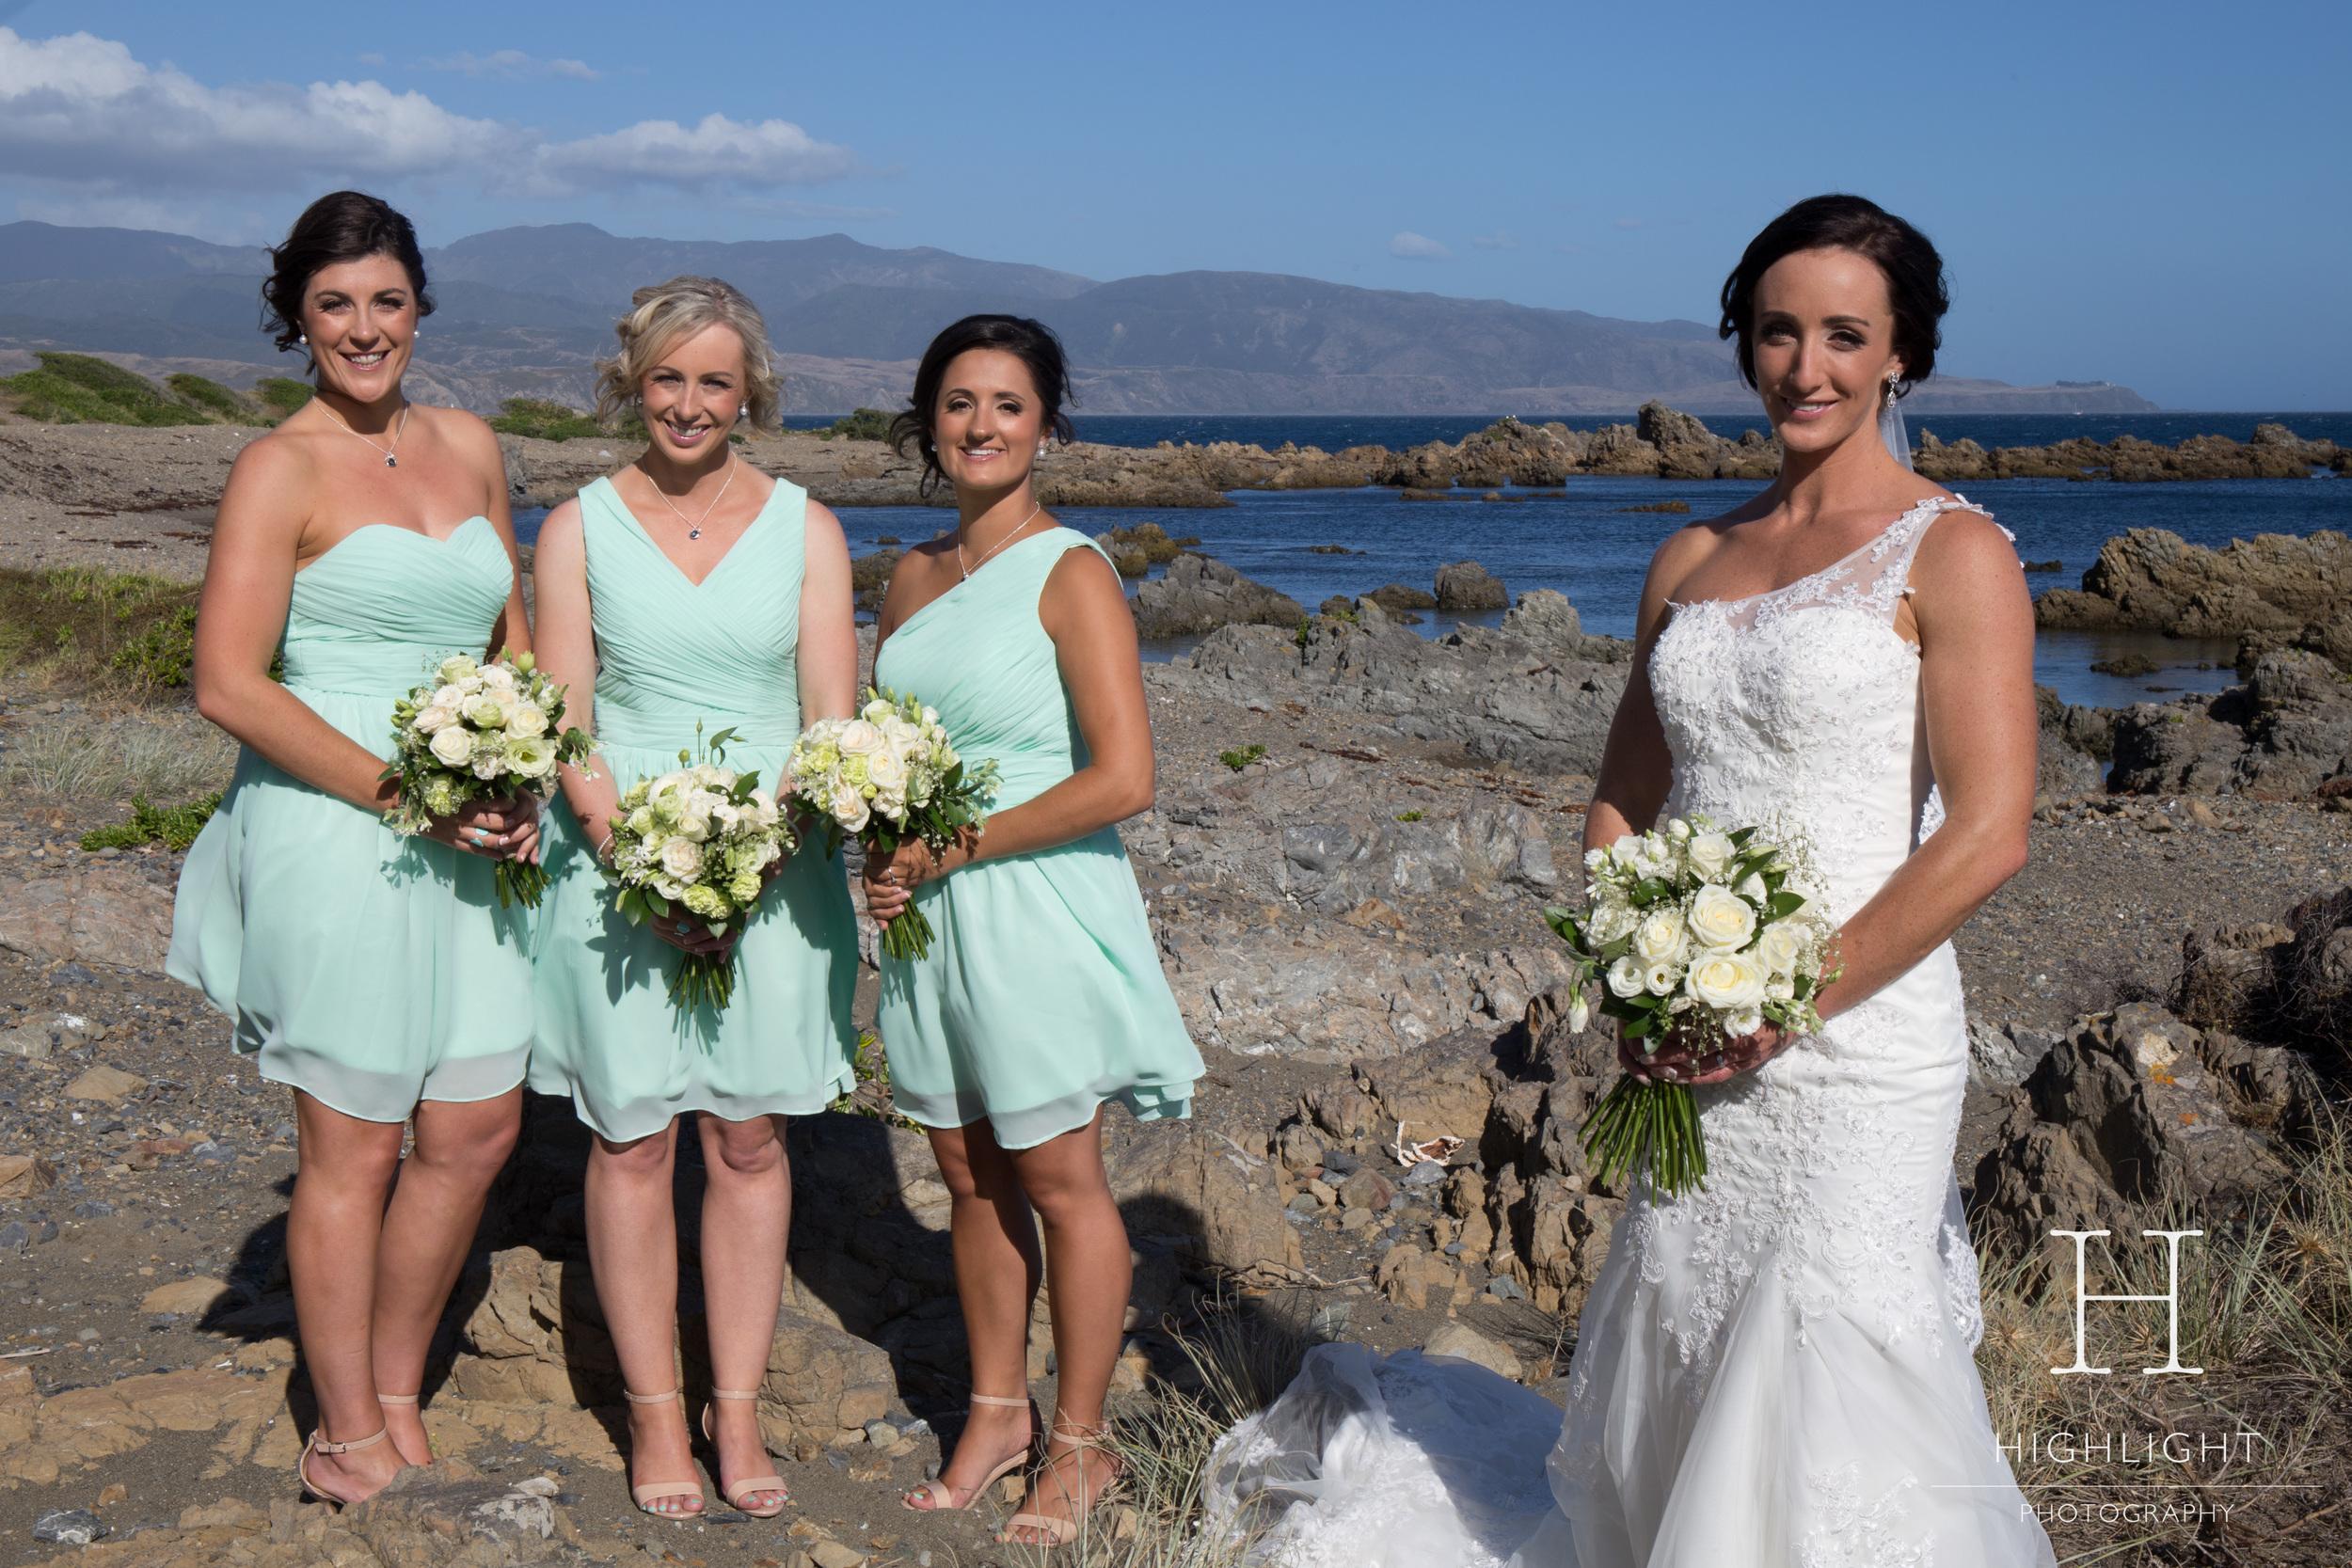 highlight_photography_wedding_new_zealand_kristibridesmaids2.jpg